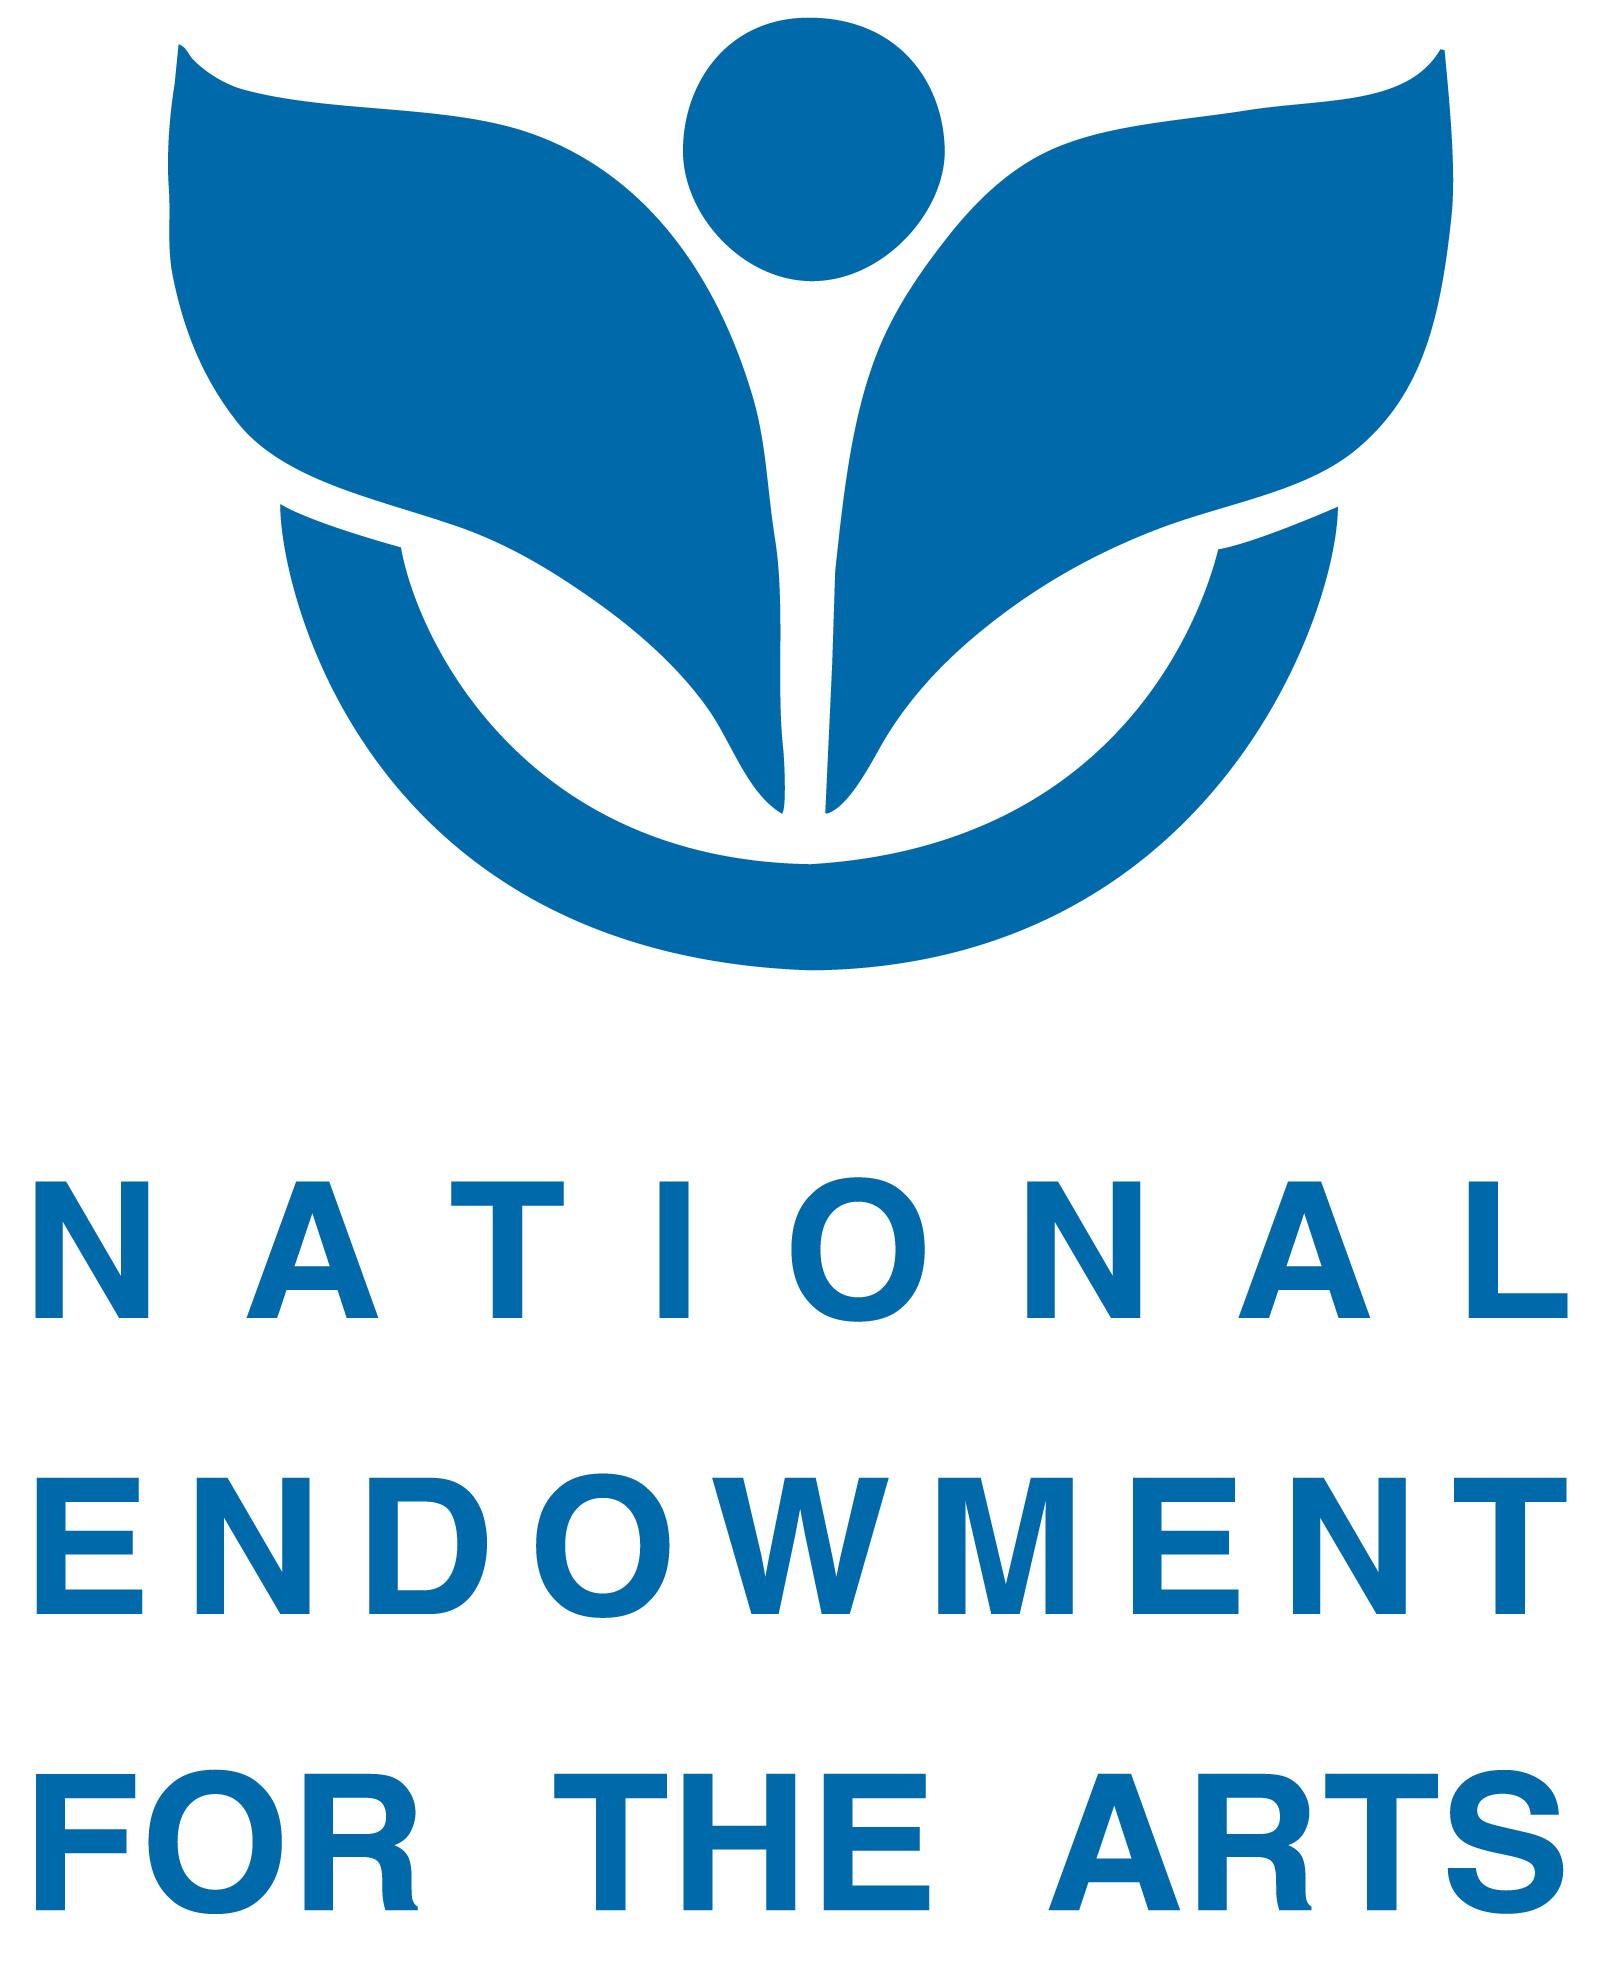 National-Endowment-for-the-Arts-Logo.jpg